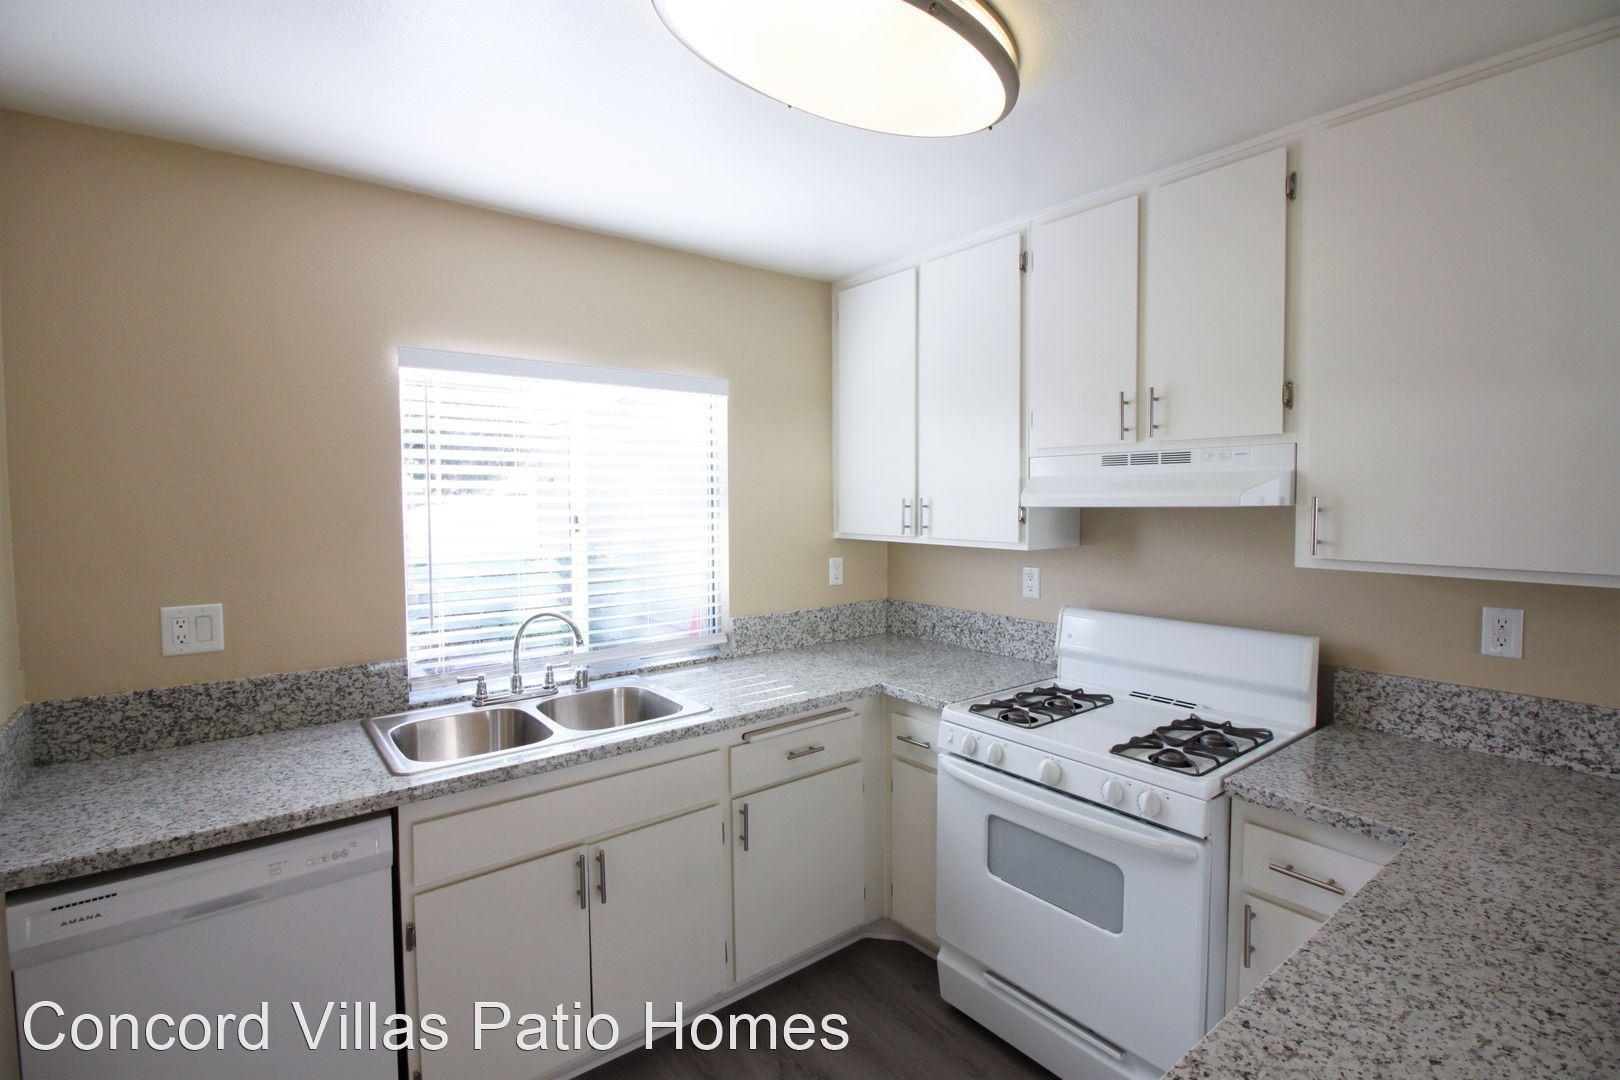 Concord Villas for rent